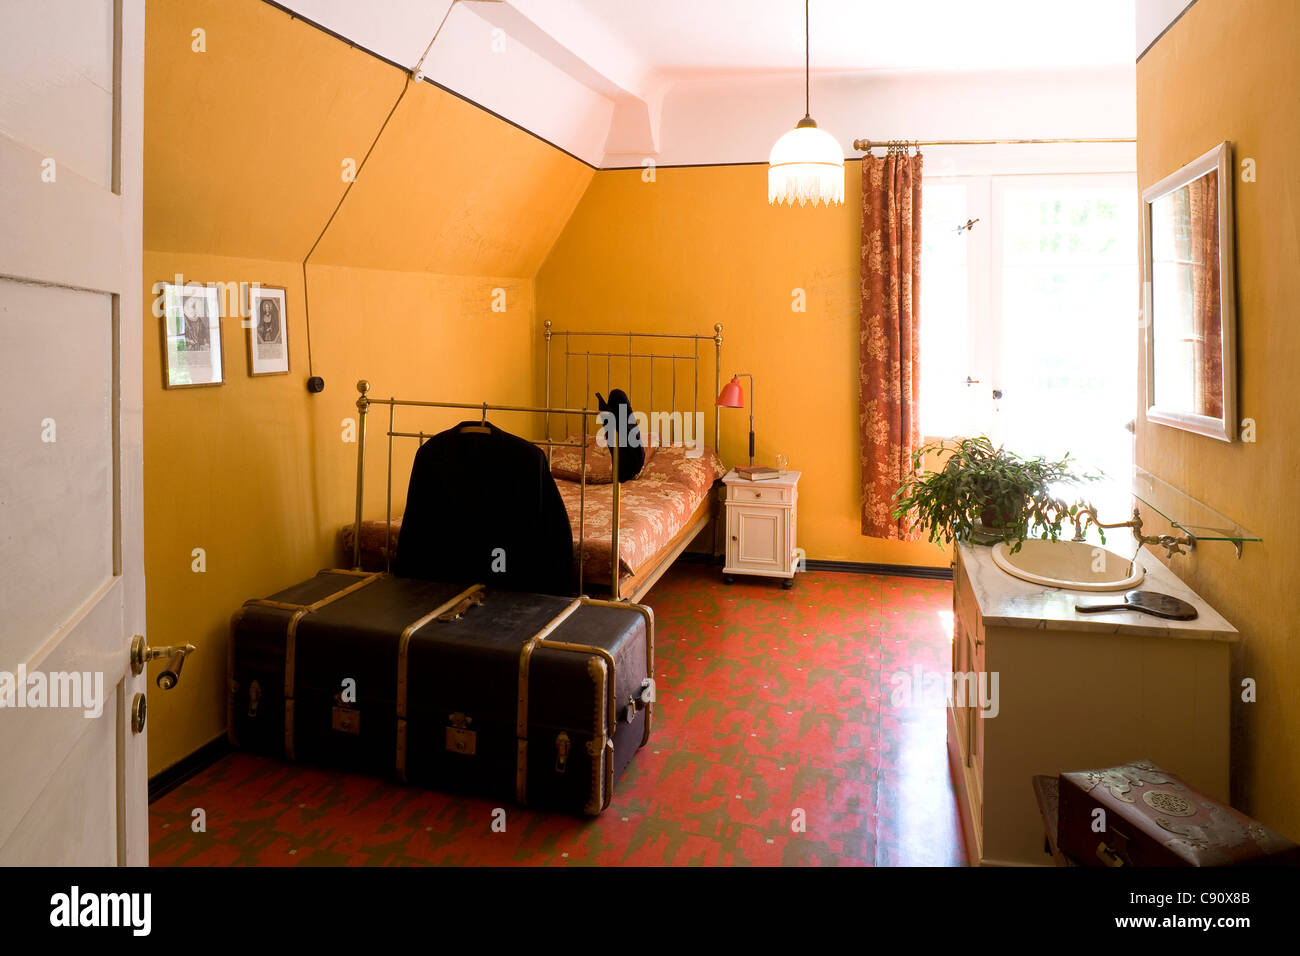 Bedroom at Gerhart-Hauptmann-Haus, Haus Seedorn, Kloster, isle of Hiddensee, Mecklenburg-Western Pomerania, Germany, - Stock Image